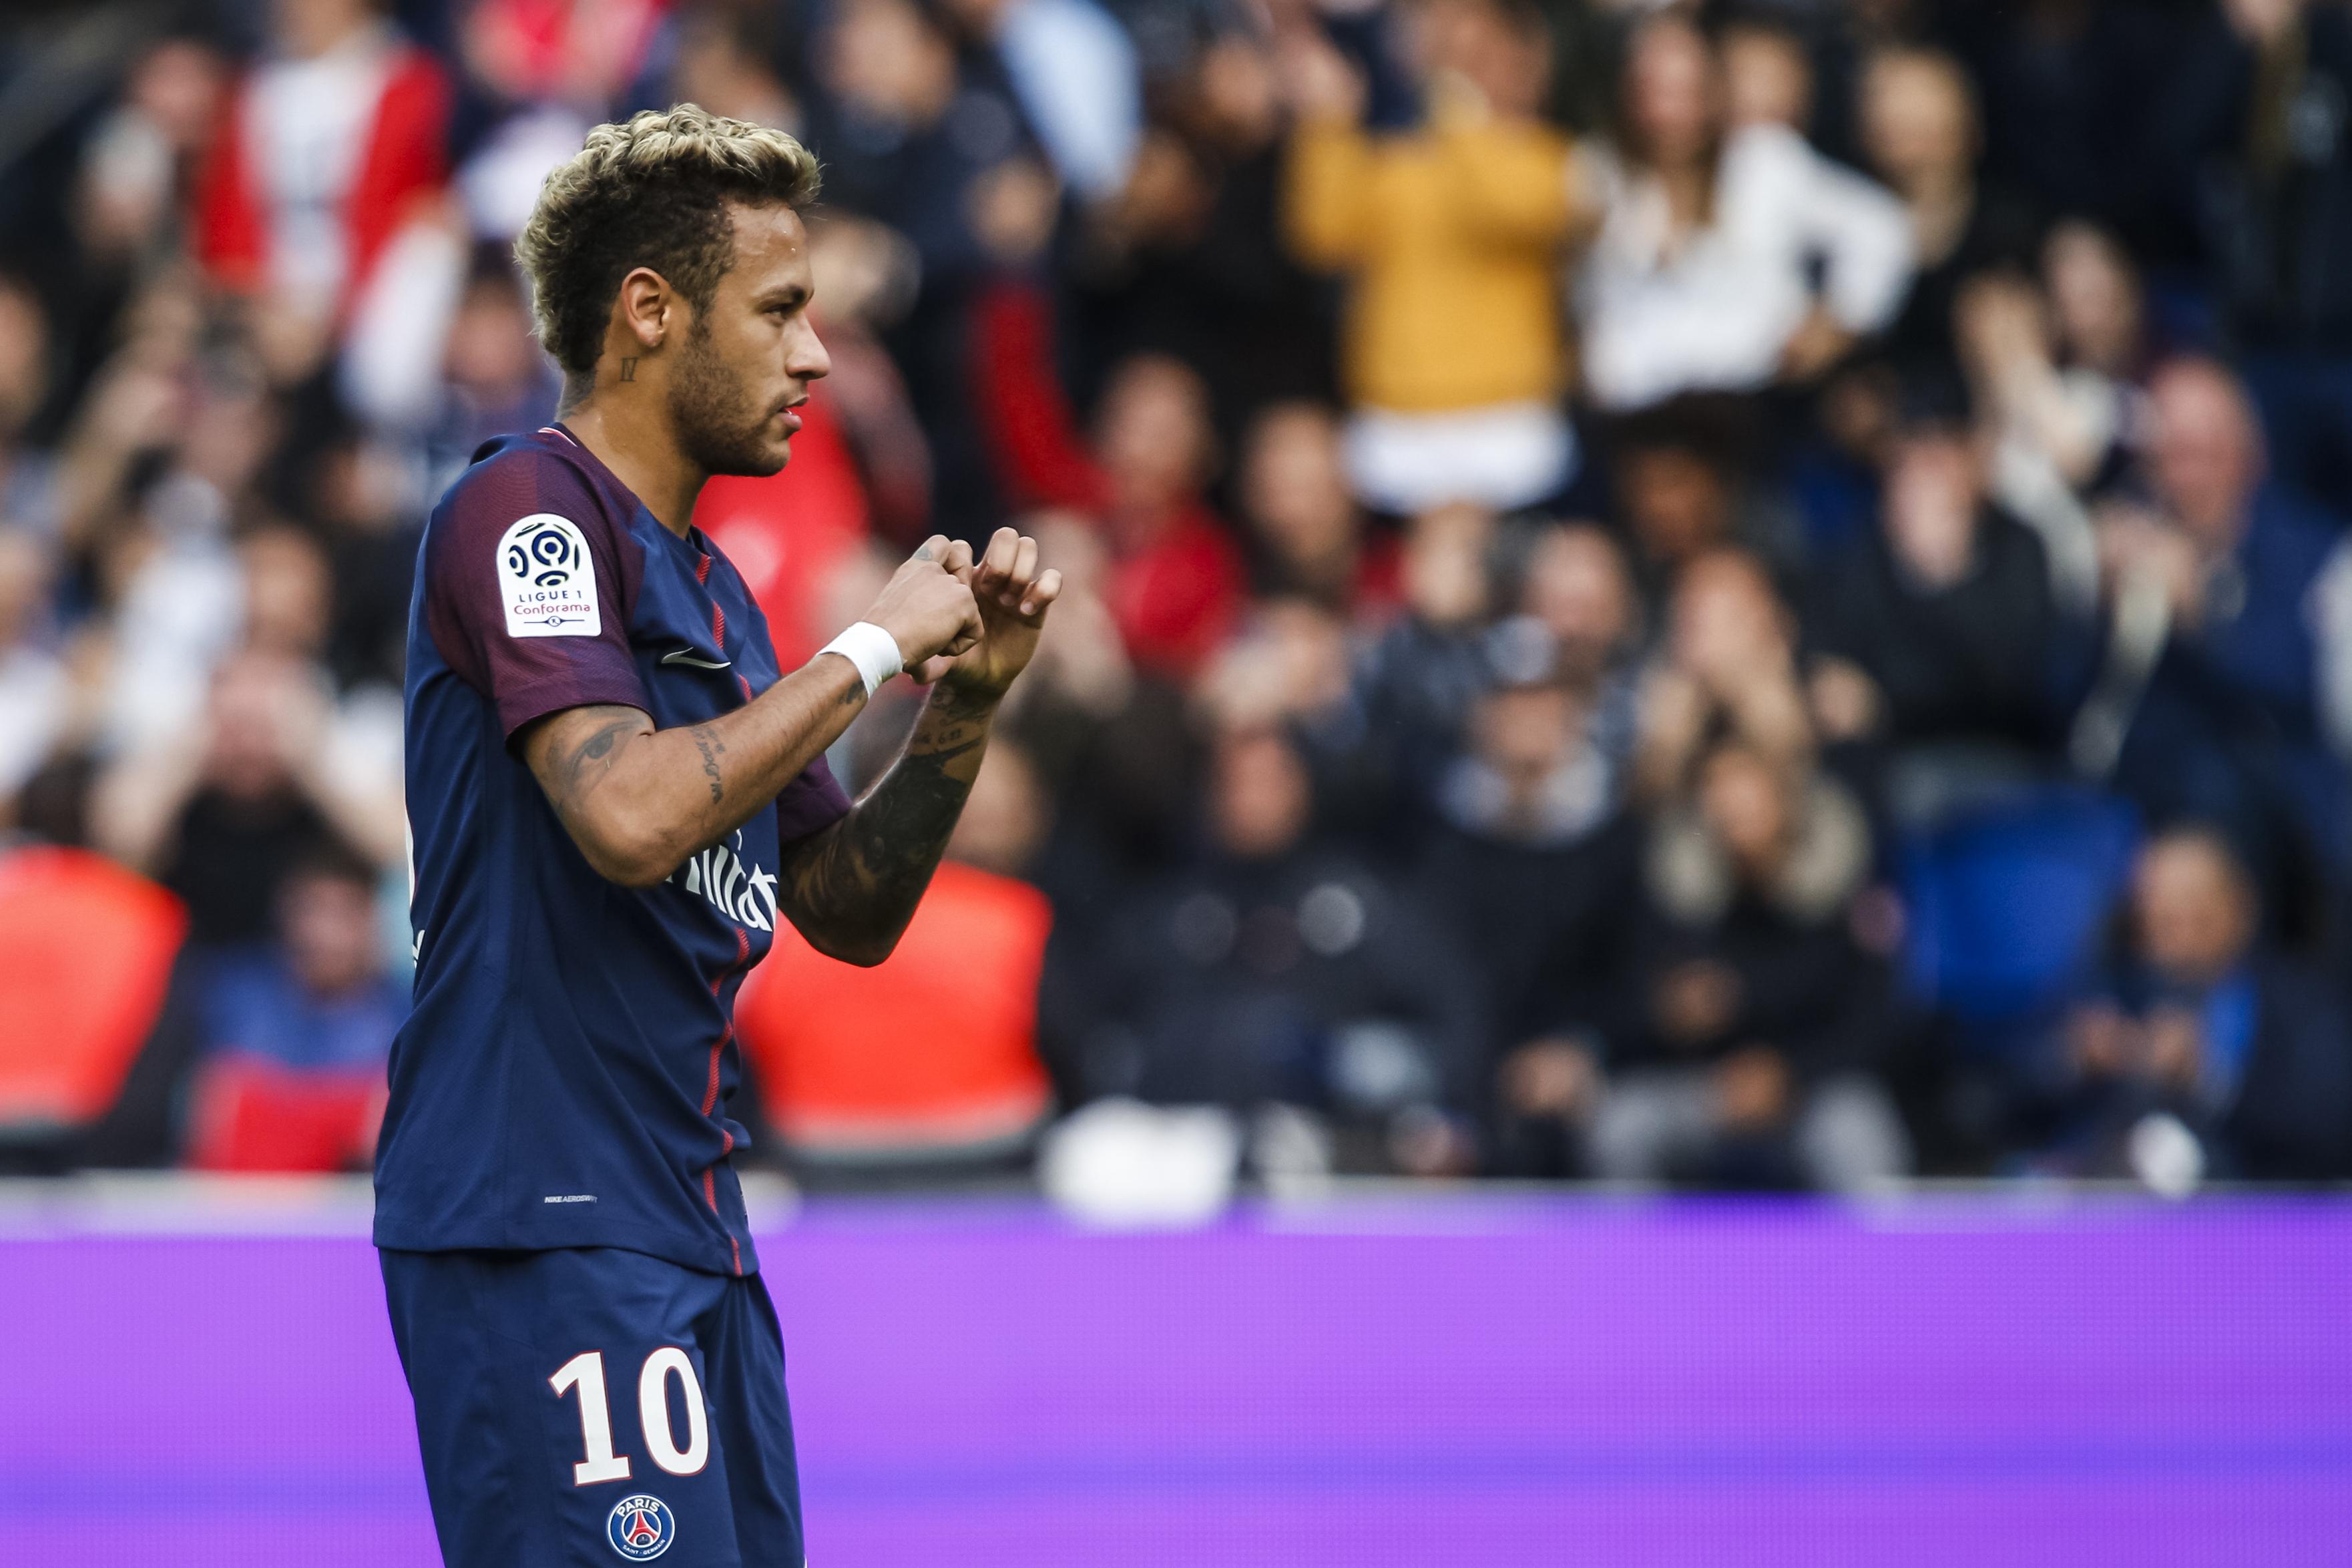 We do not need to be friends — Cavani on Neymar